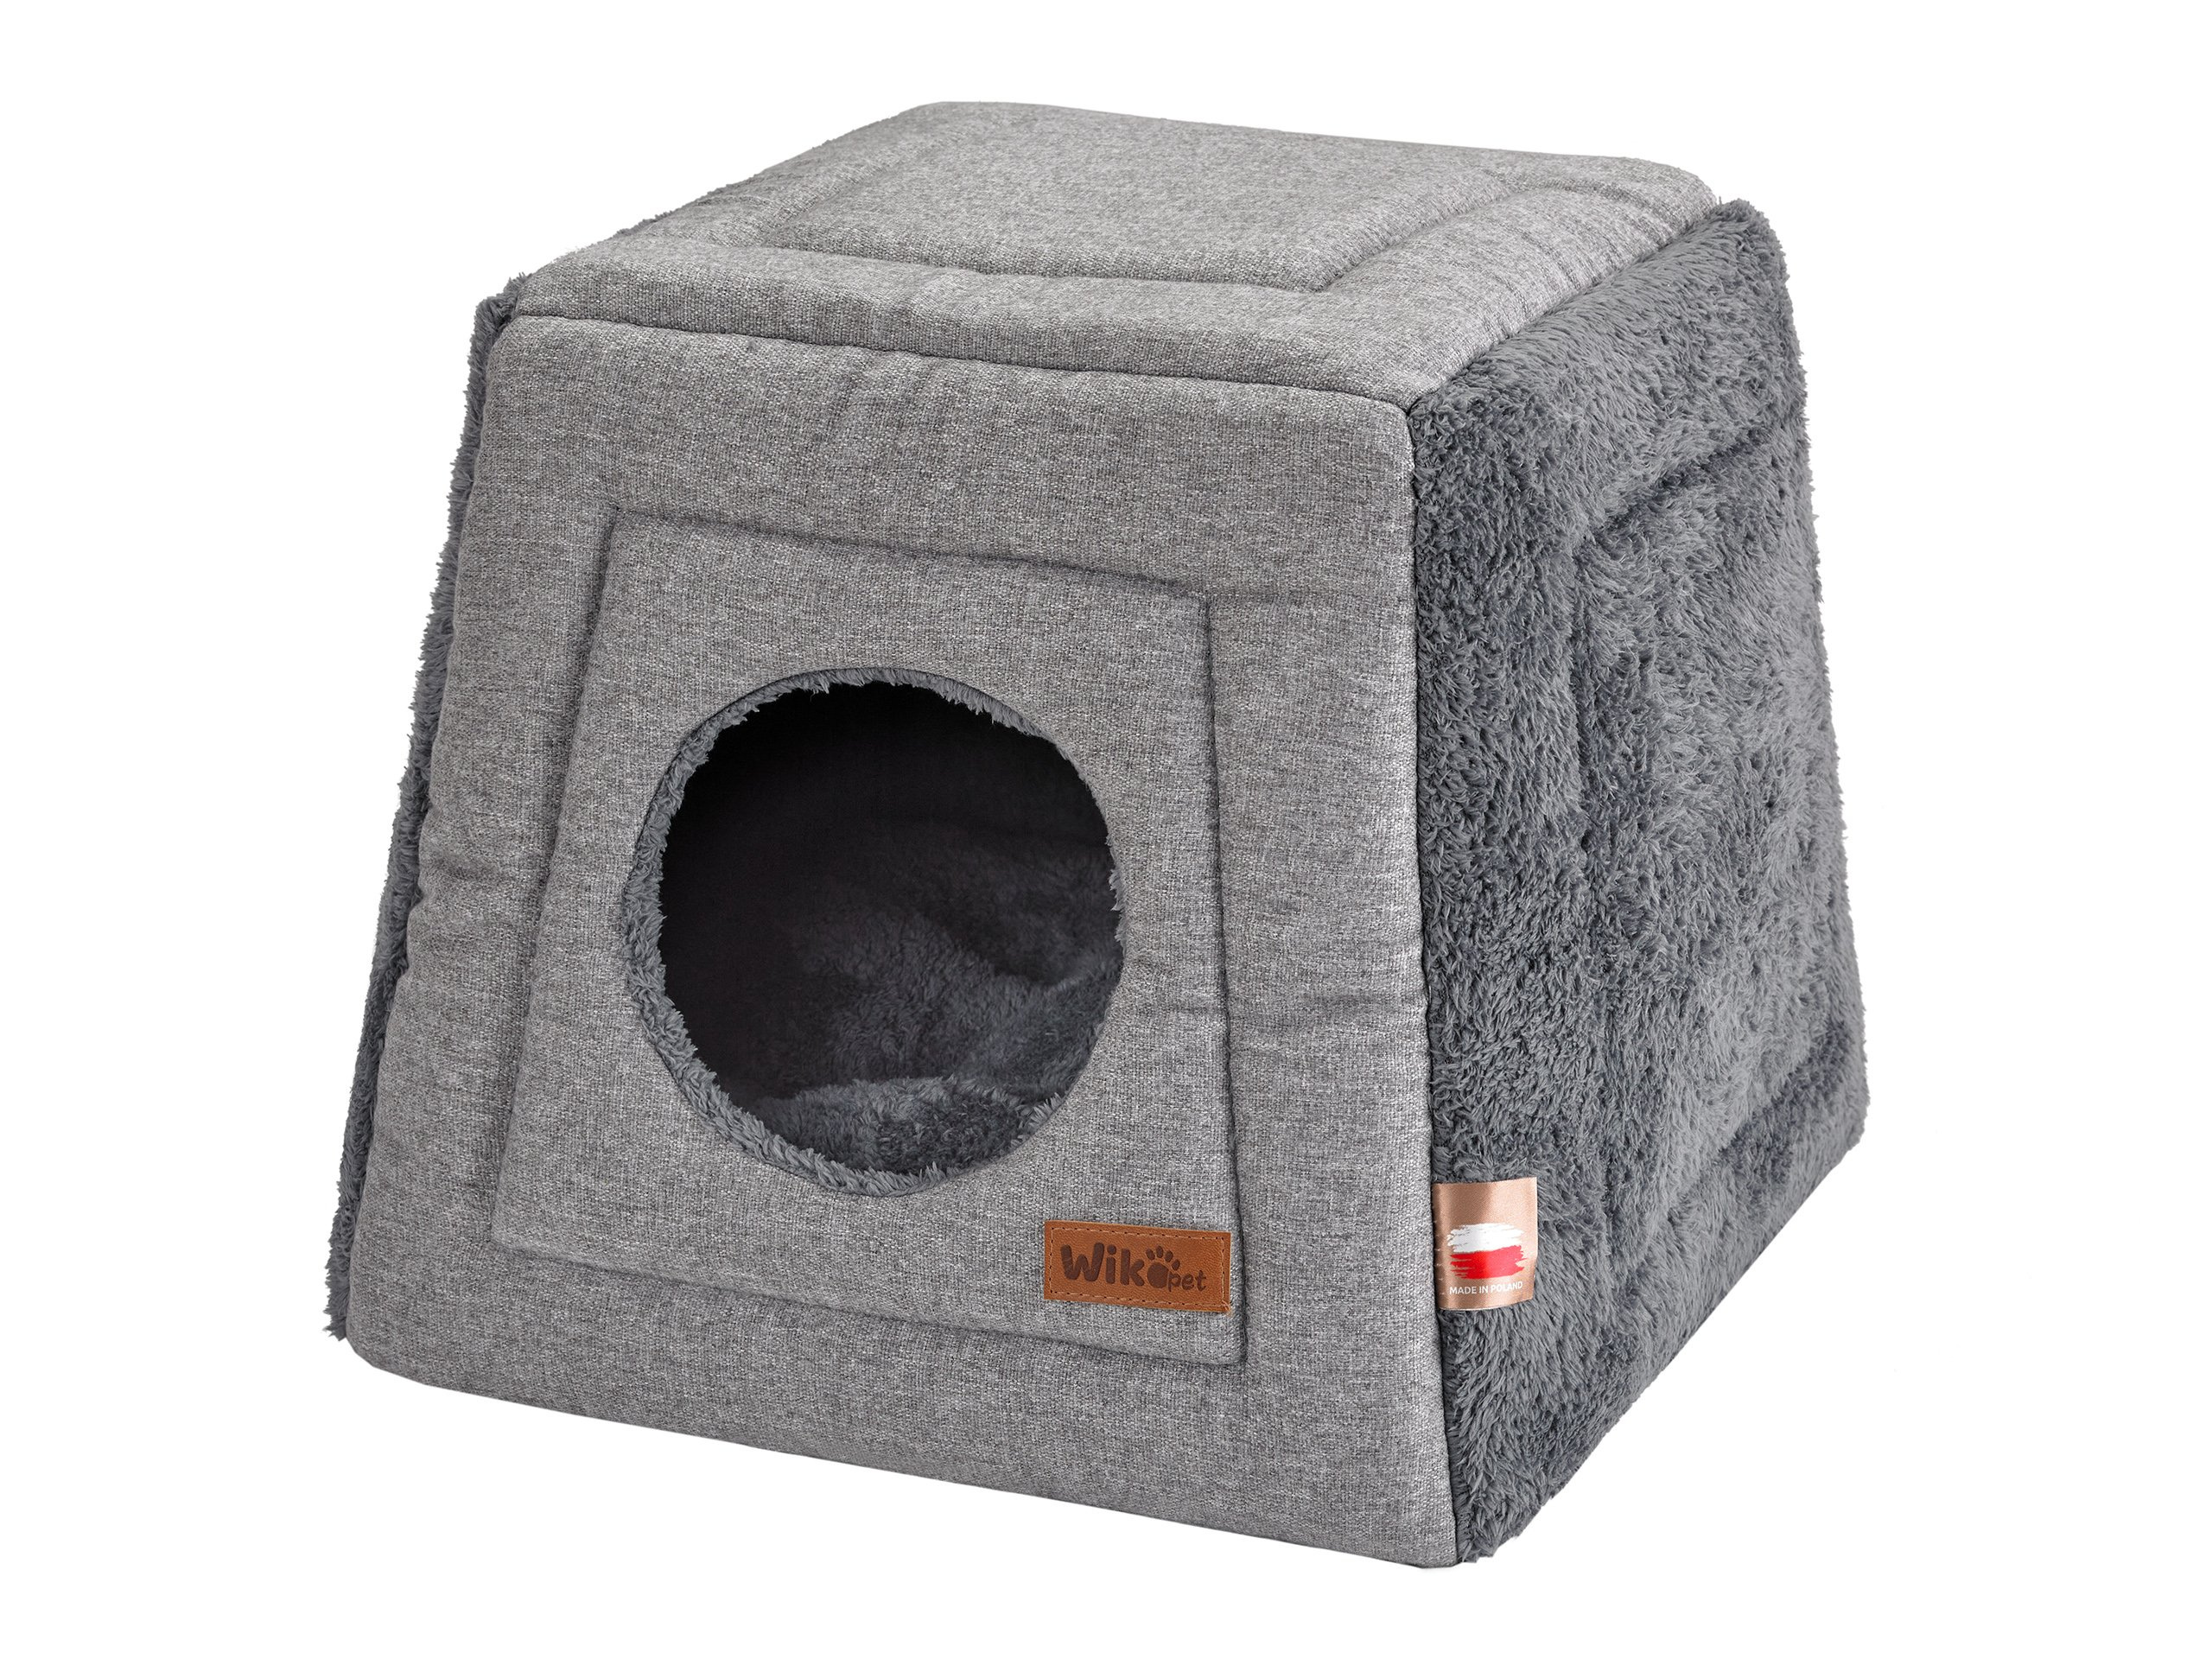 WIKOPET LEGOWISKO Fantasy Box 3in1 40X40x35 cm